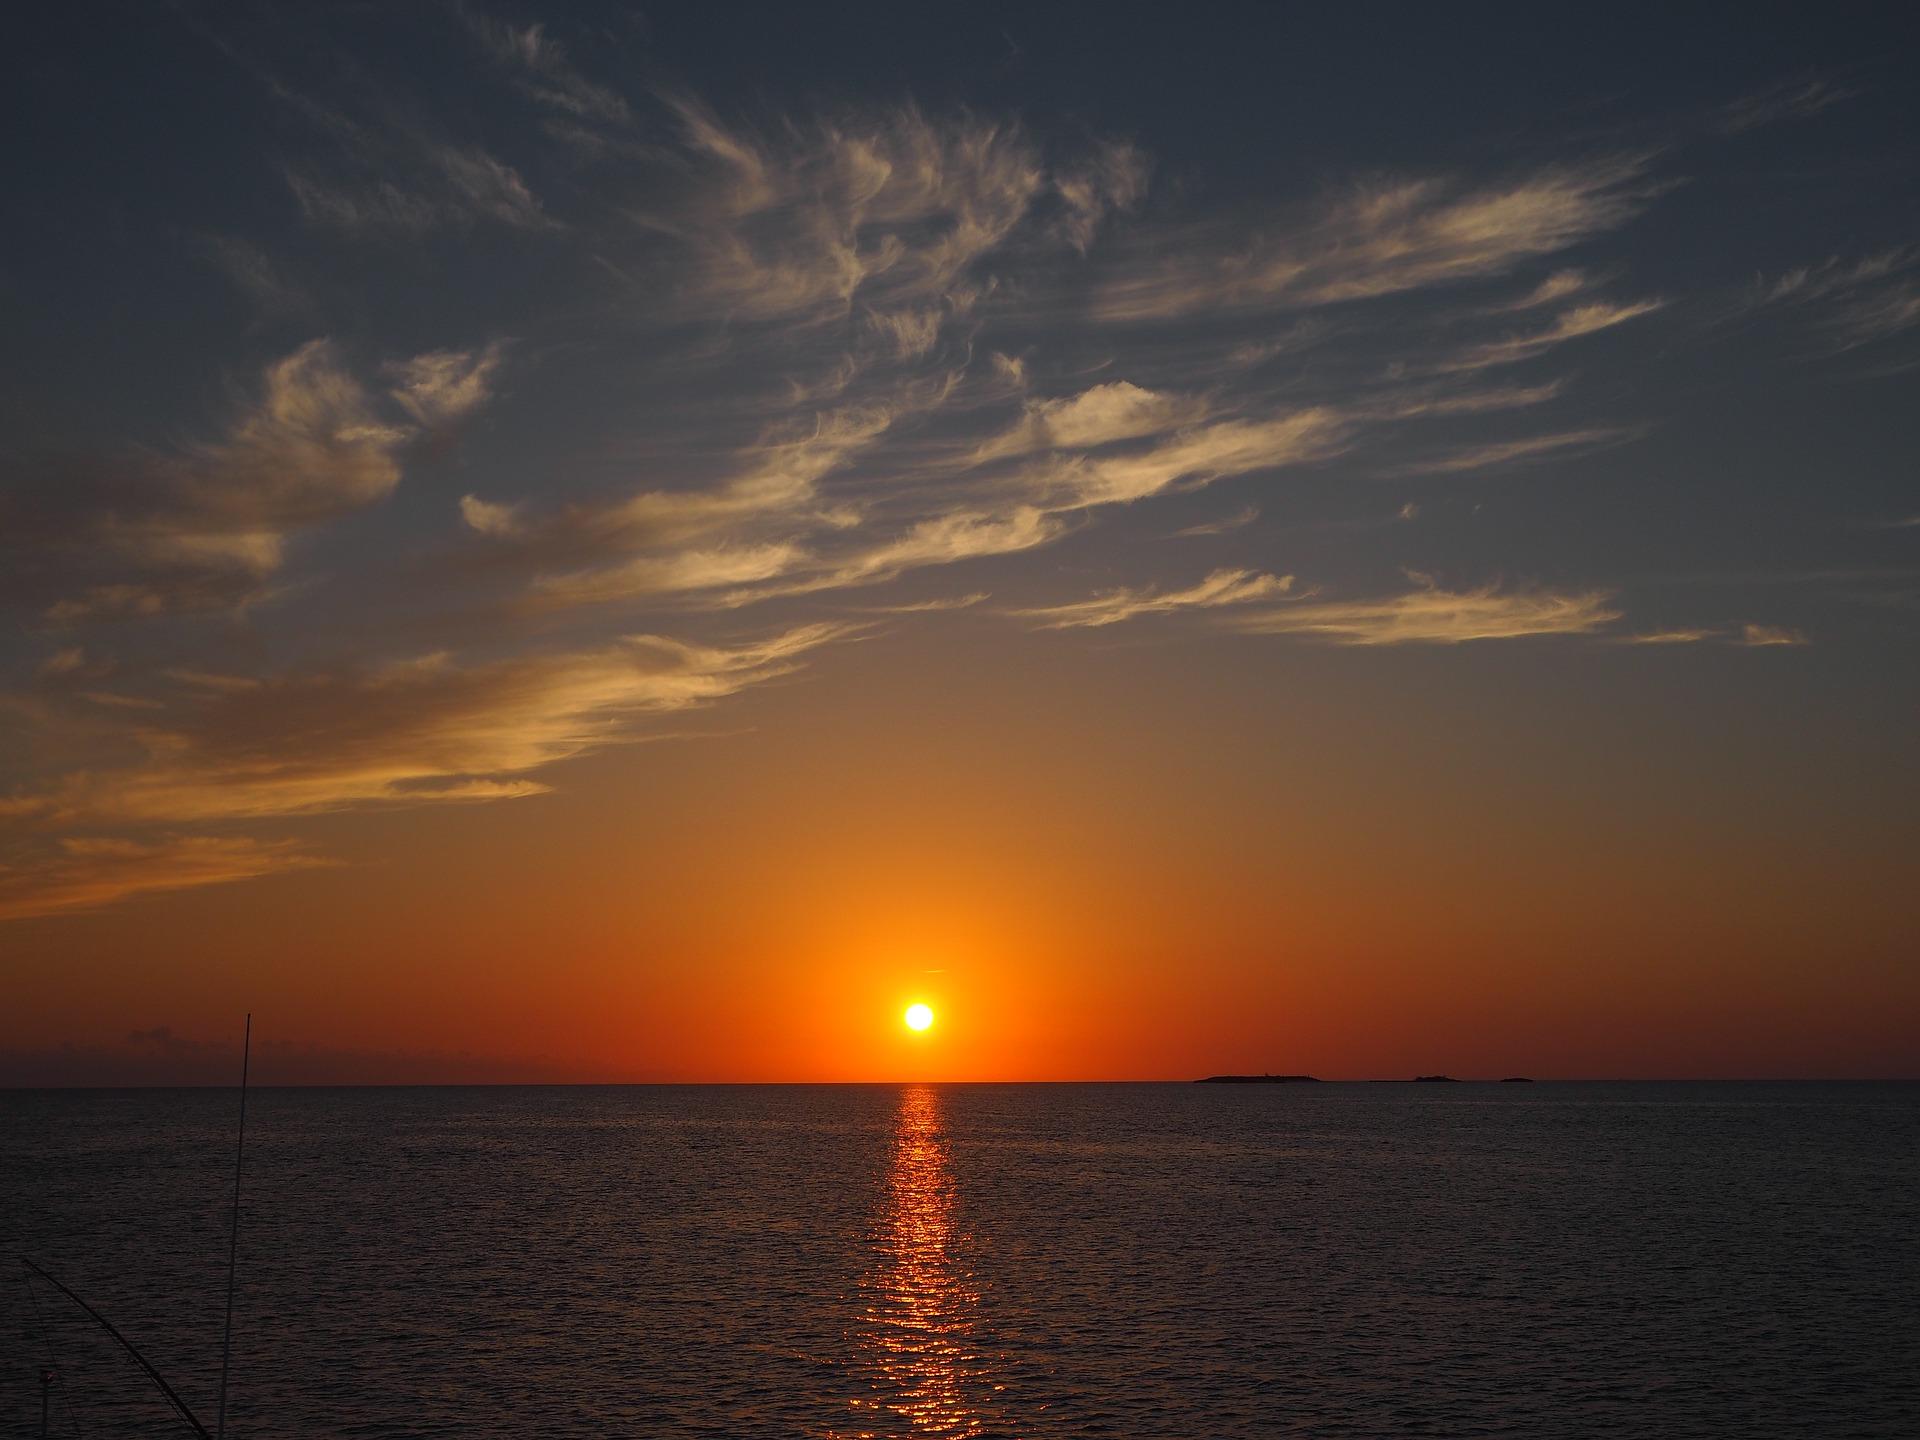 sunset-2428829_1920